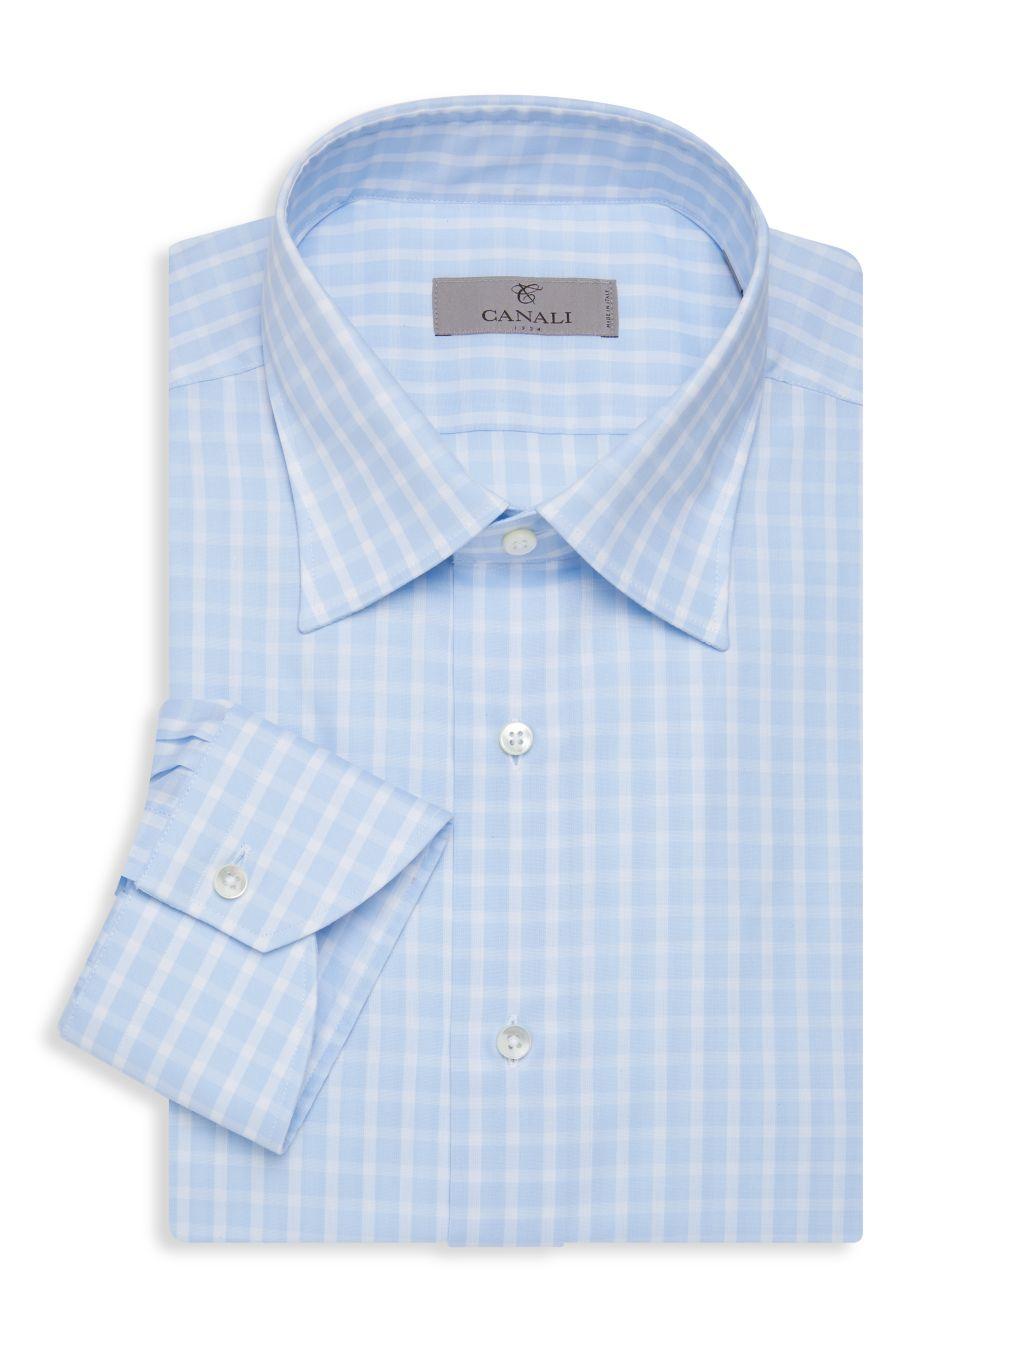 Canali Modern-Fit Check Dress Shirt